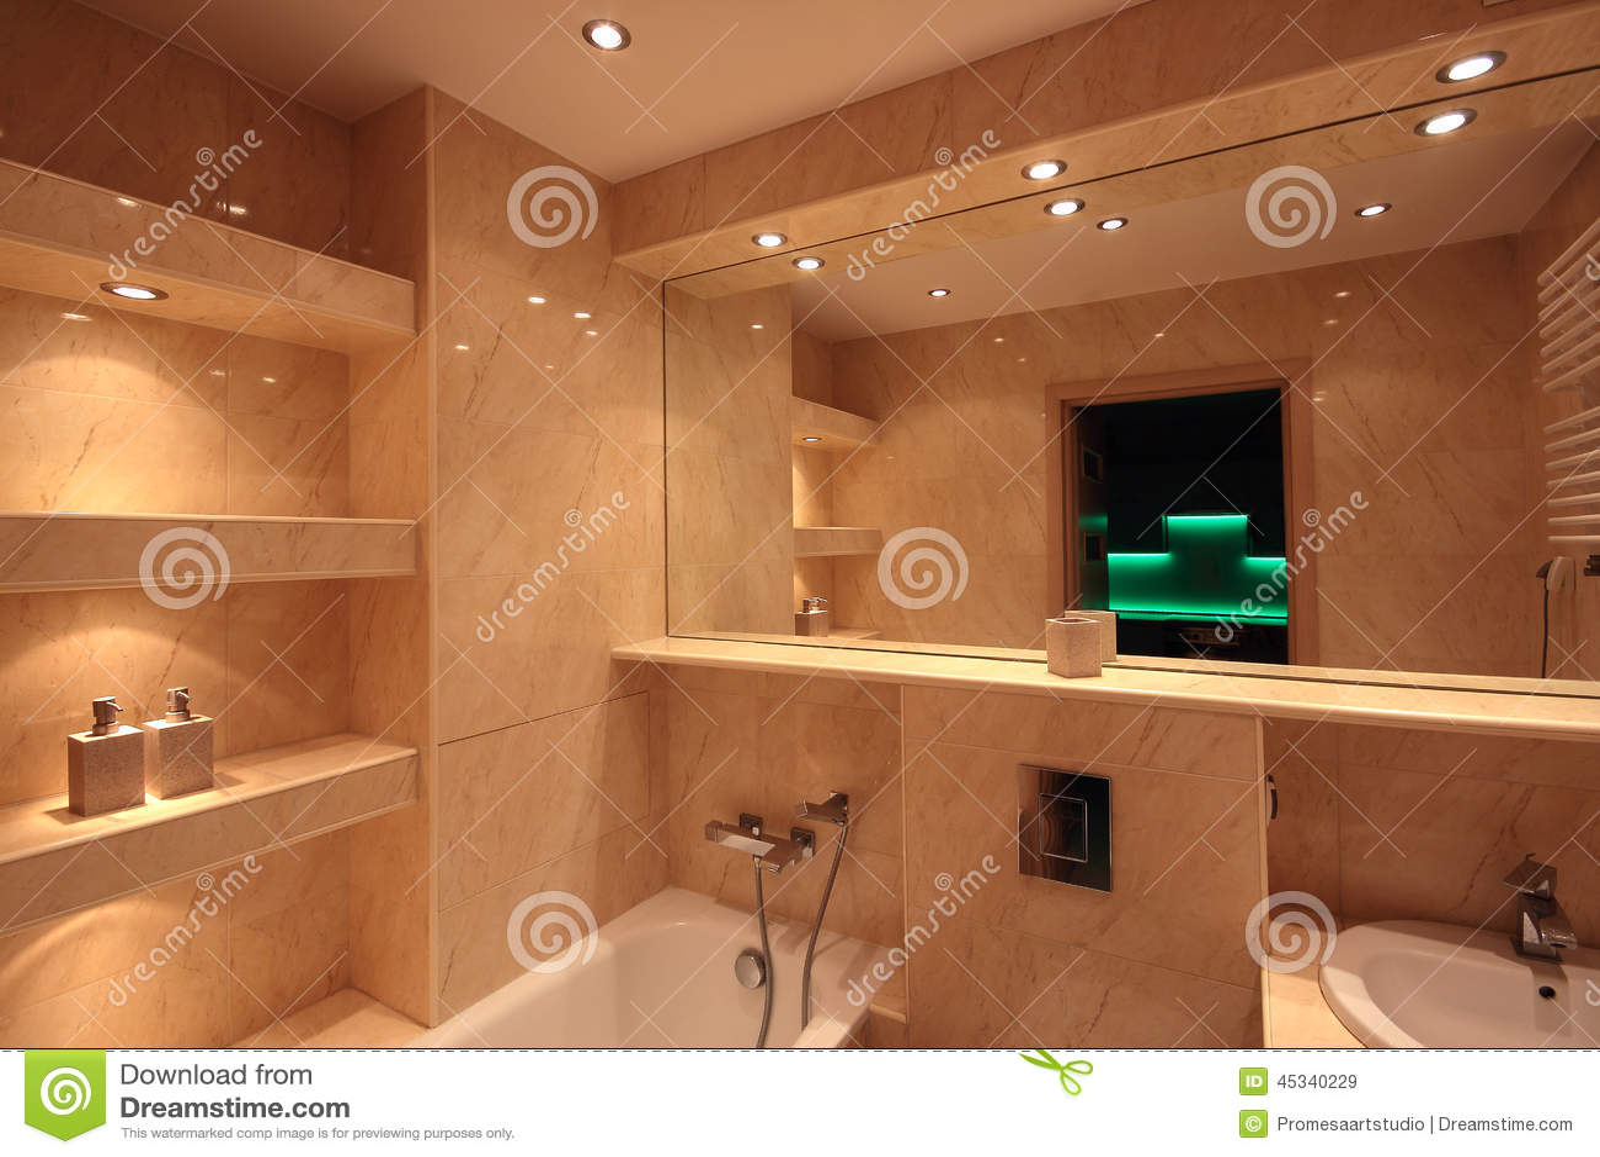 Interieur maison moderne salle de bain for Interieur salle de bain moderne